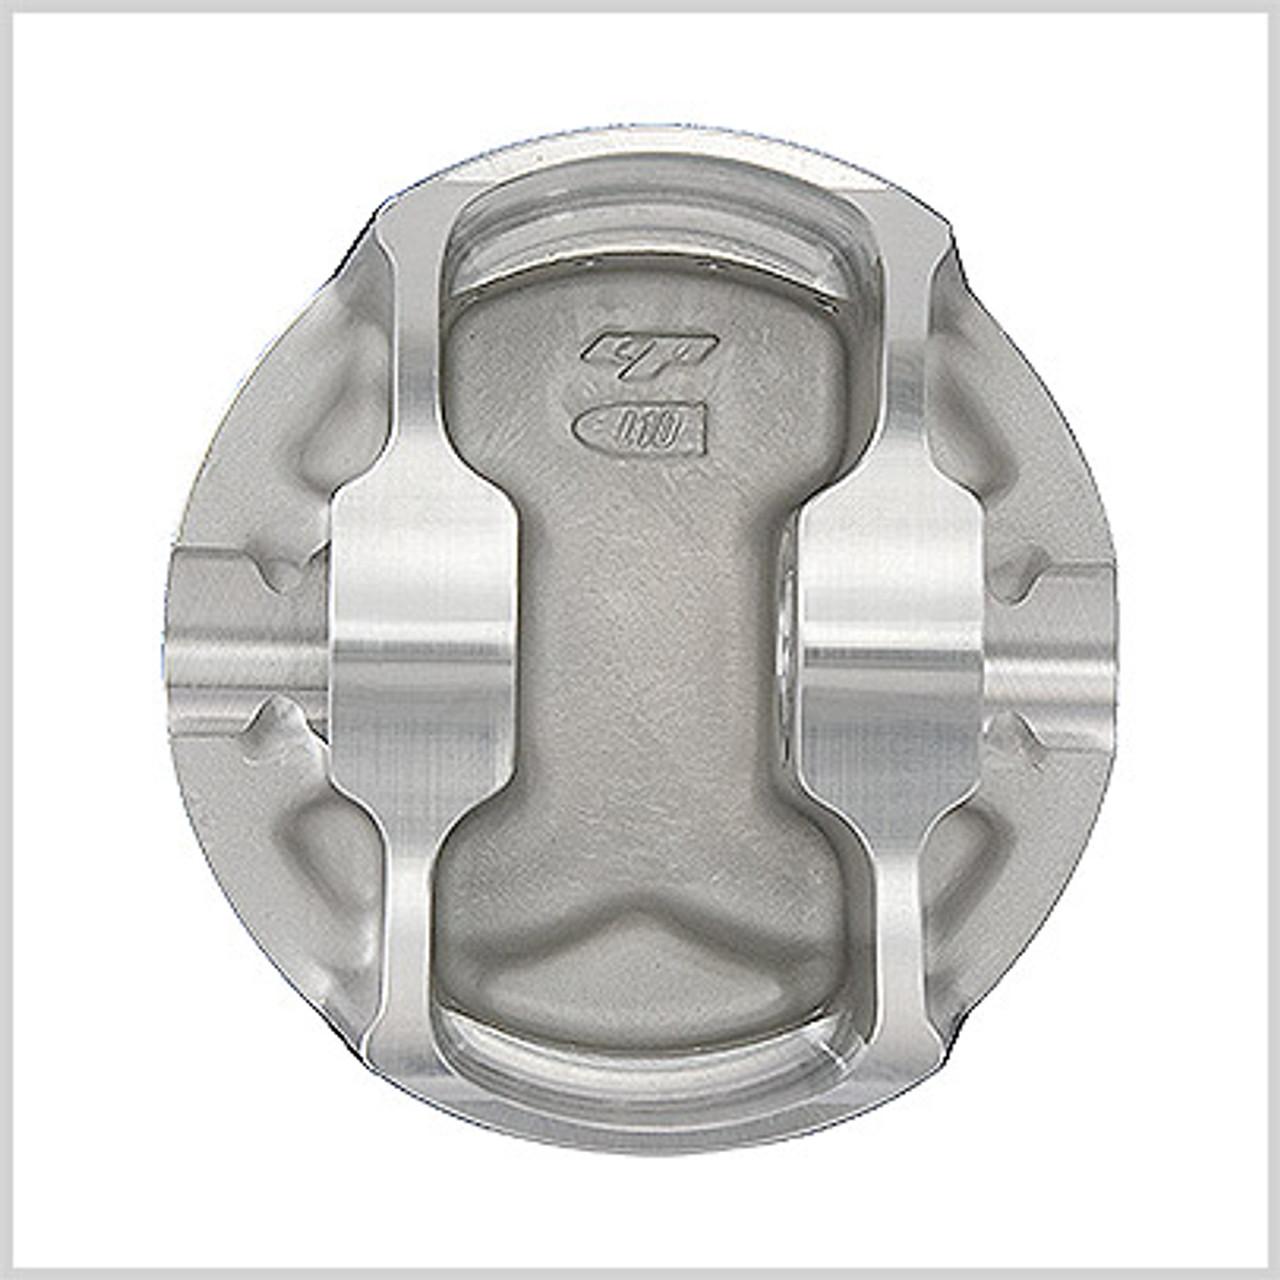 "Carillo CP Bullet LS 4.080"" Pistons Set | 4.00"" Stroke -2.7cc Flat Top | N/A"